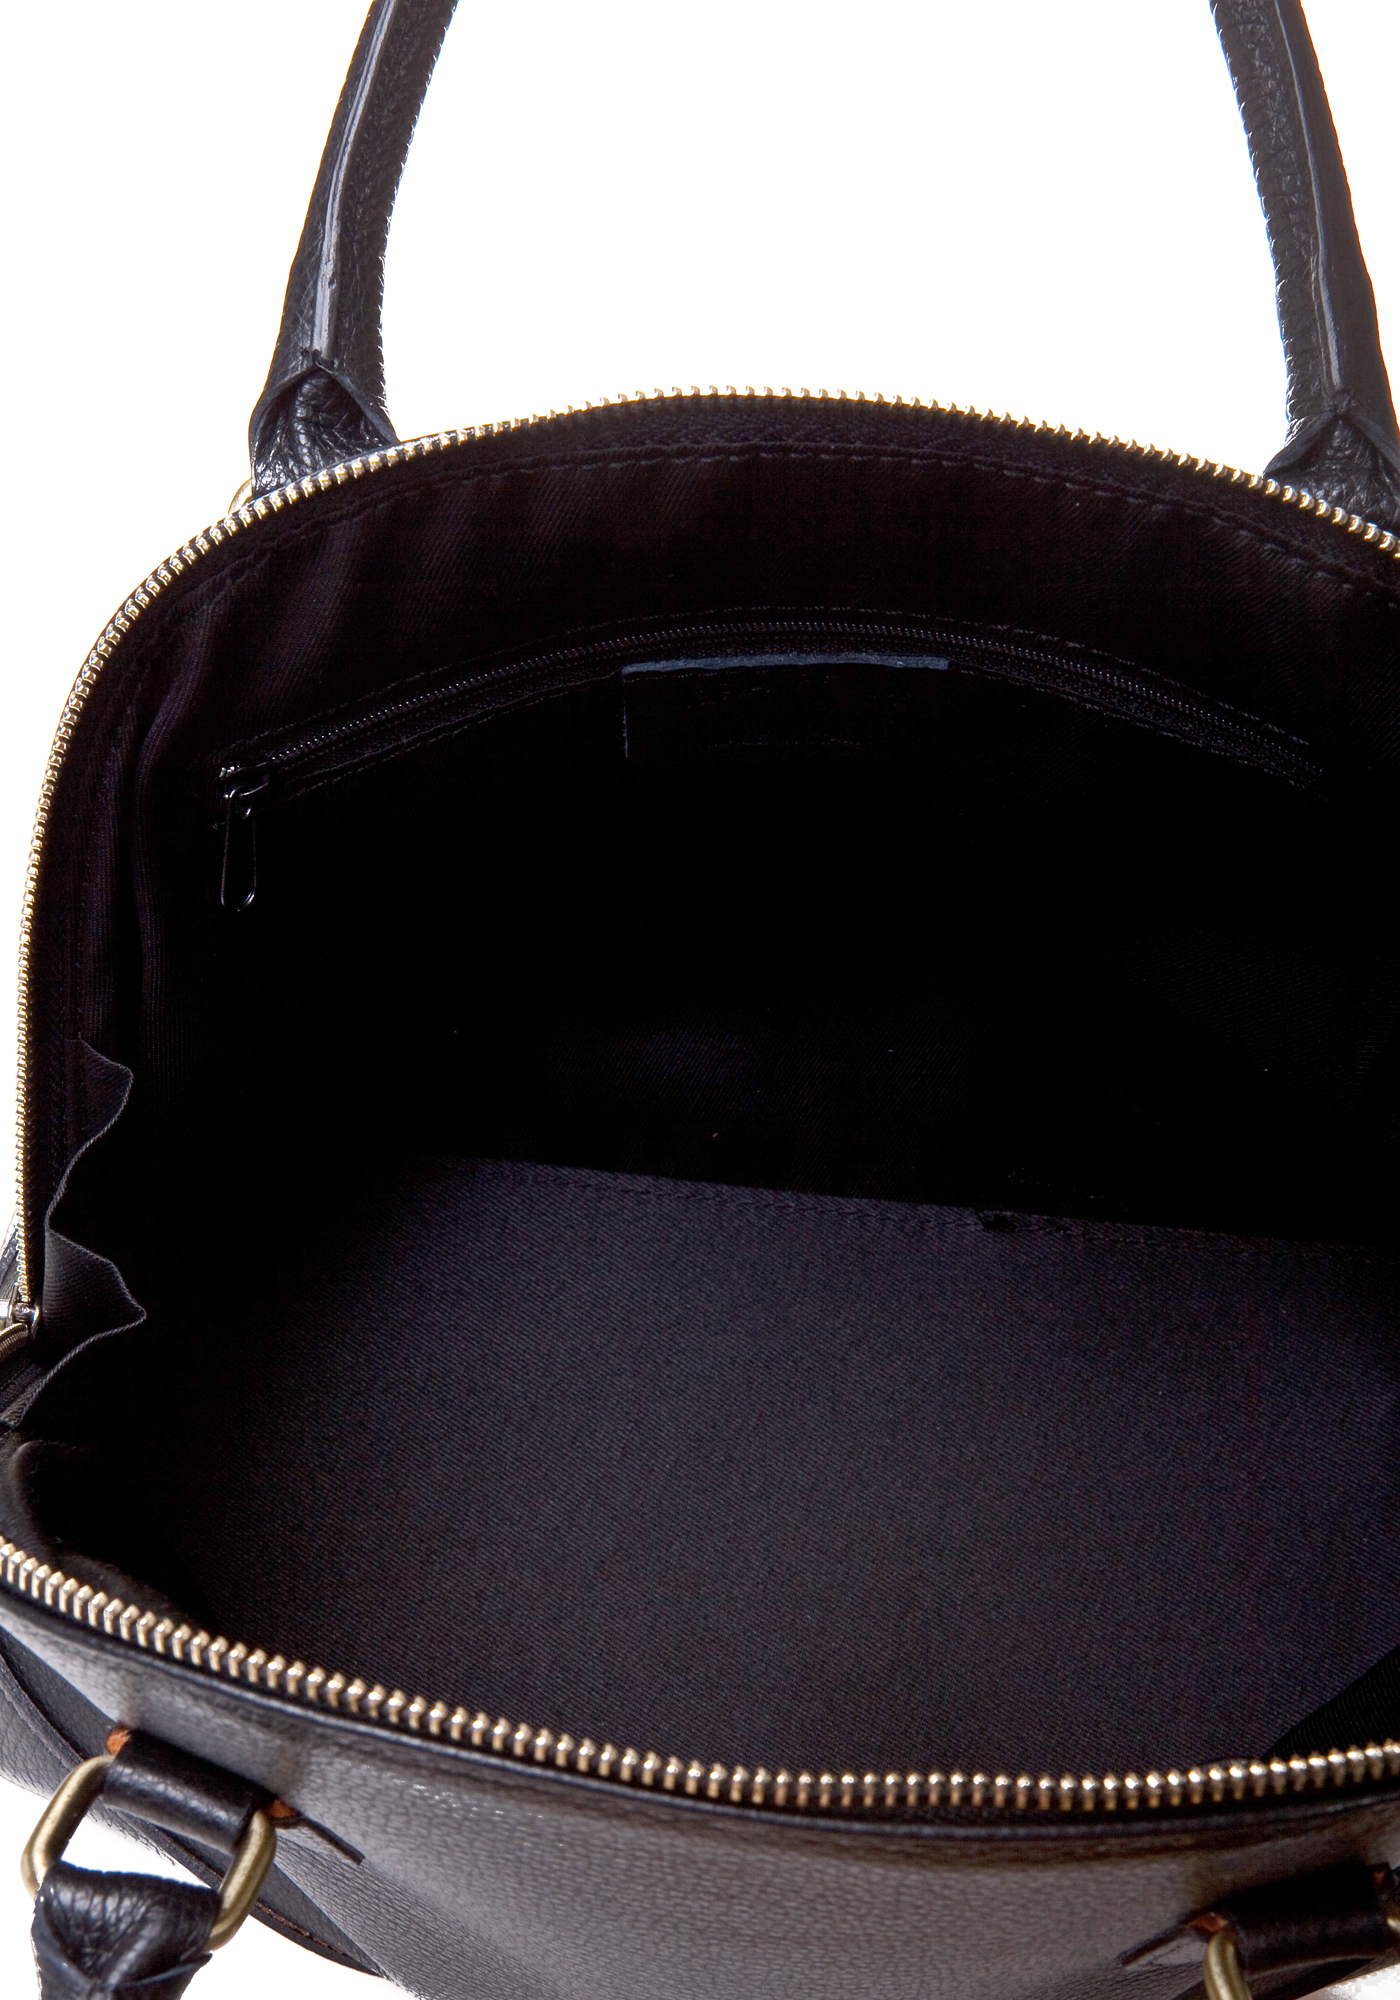 5009-BLACK-4.jpg